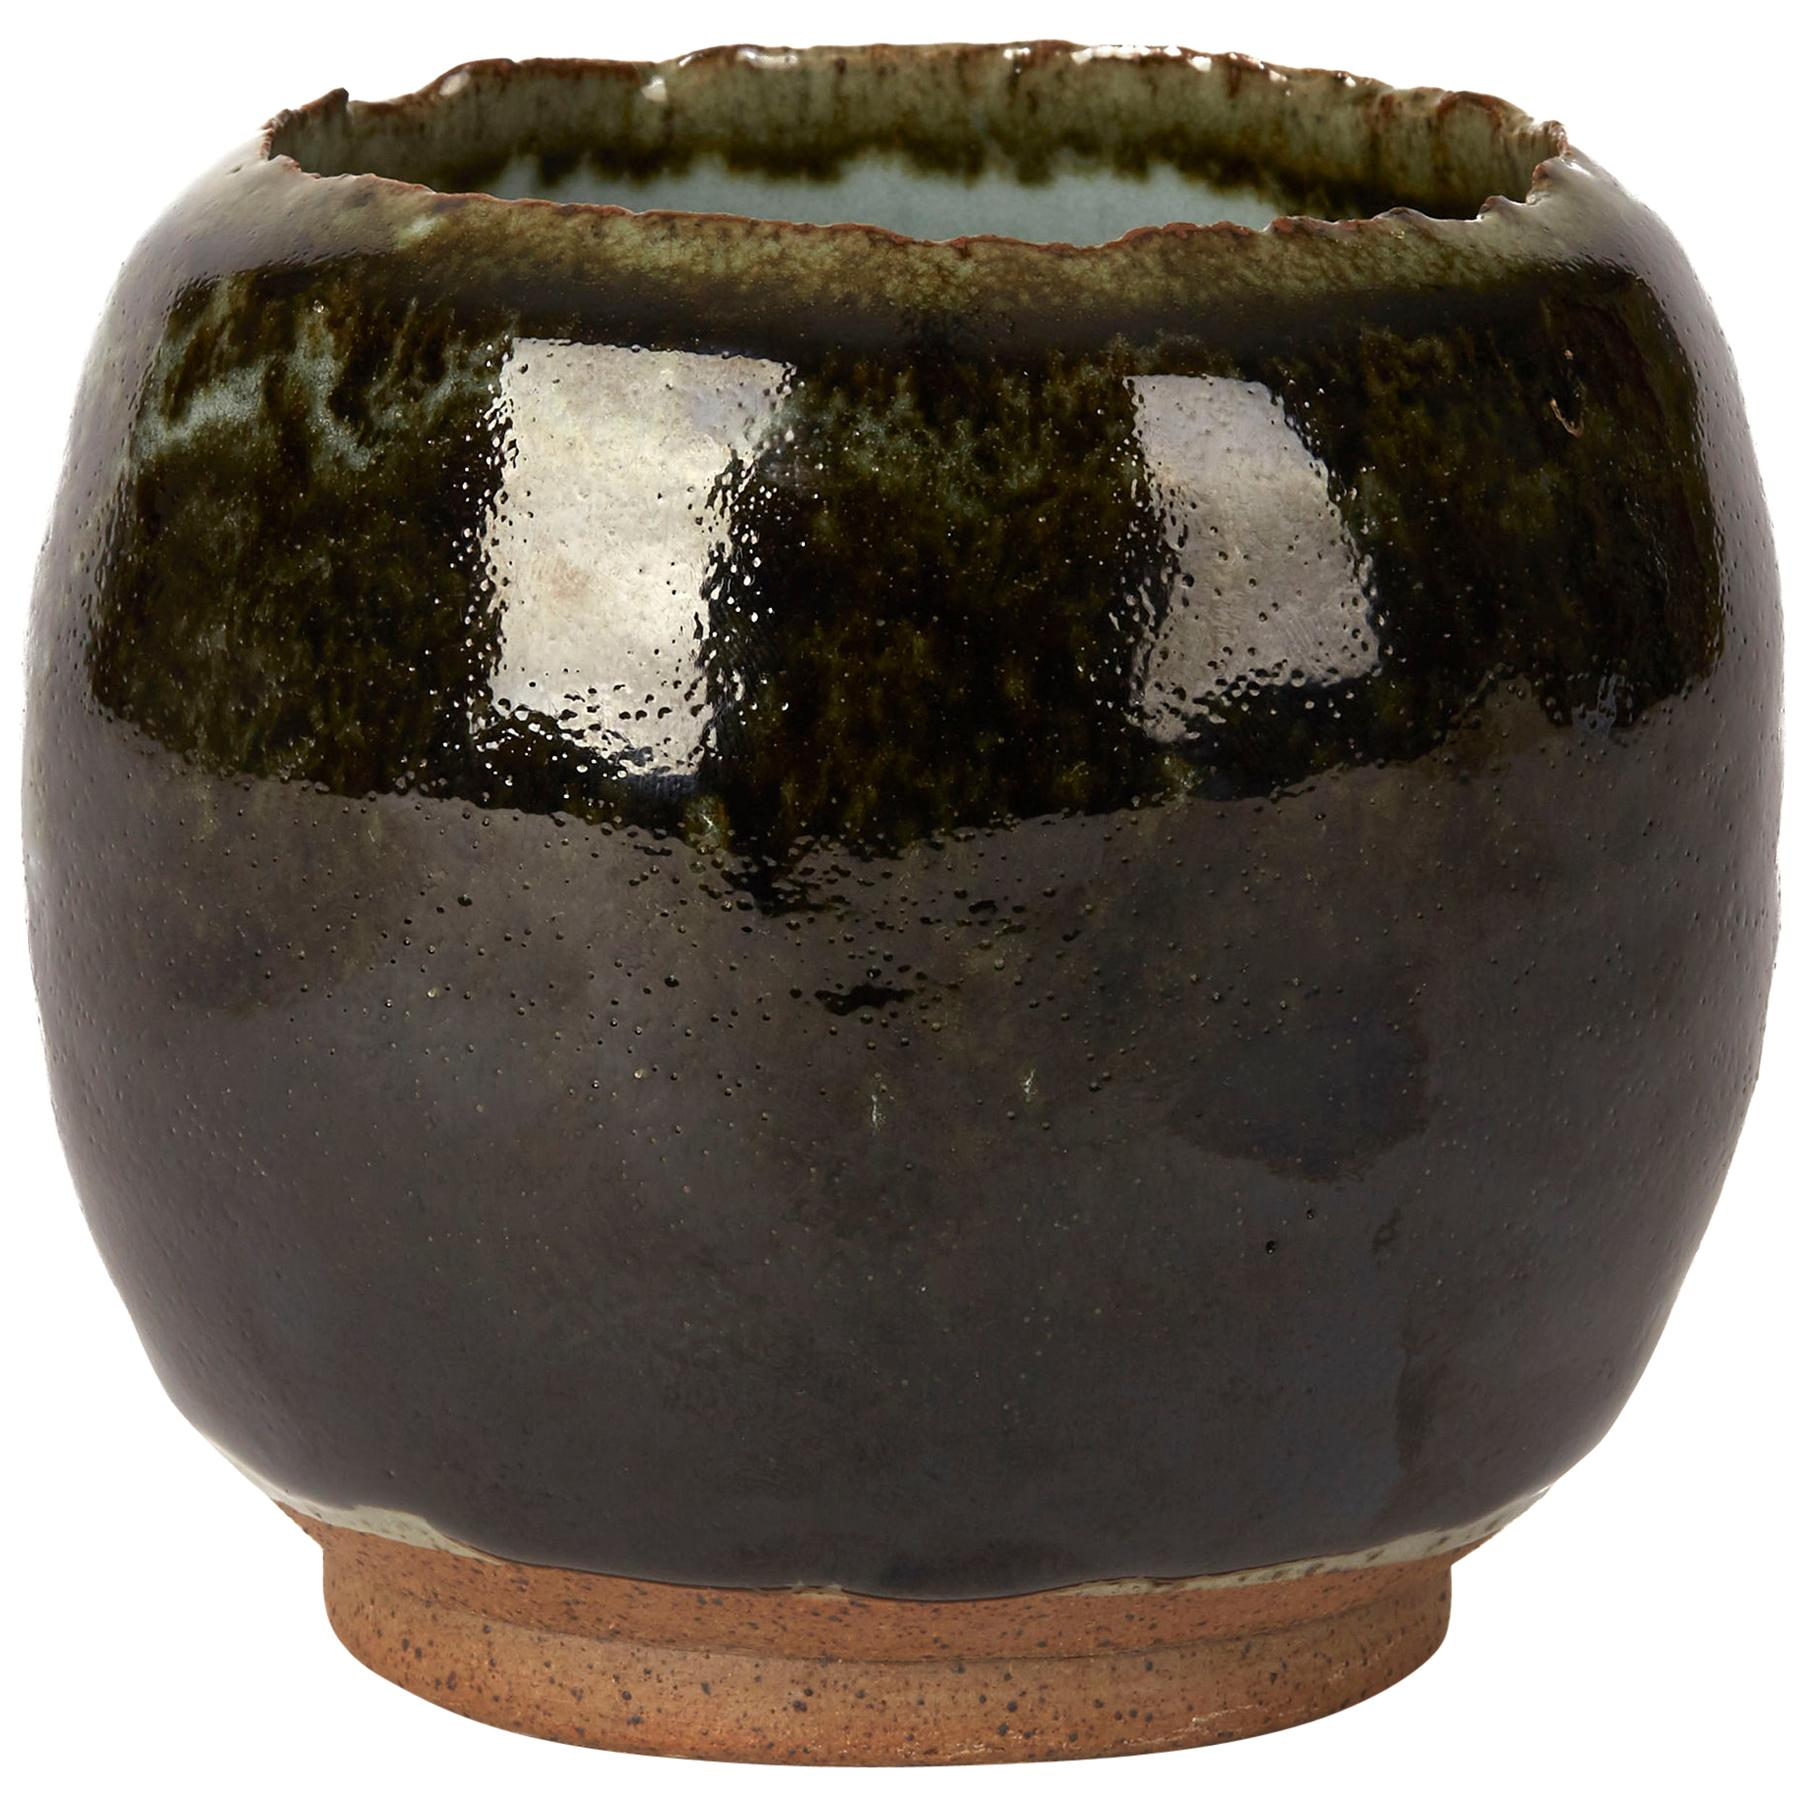 Ying Yeung Li Hand Thrown Studio Pottery Green Glazed Vase